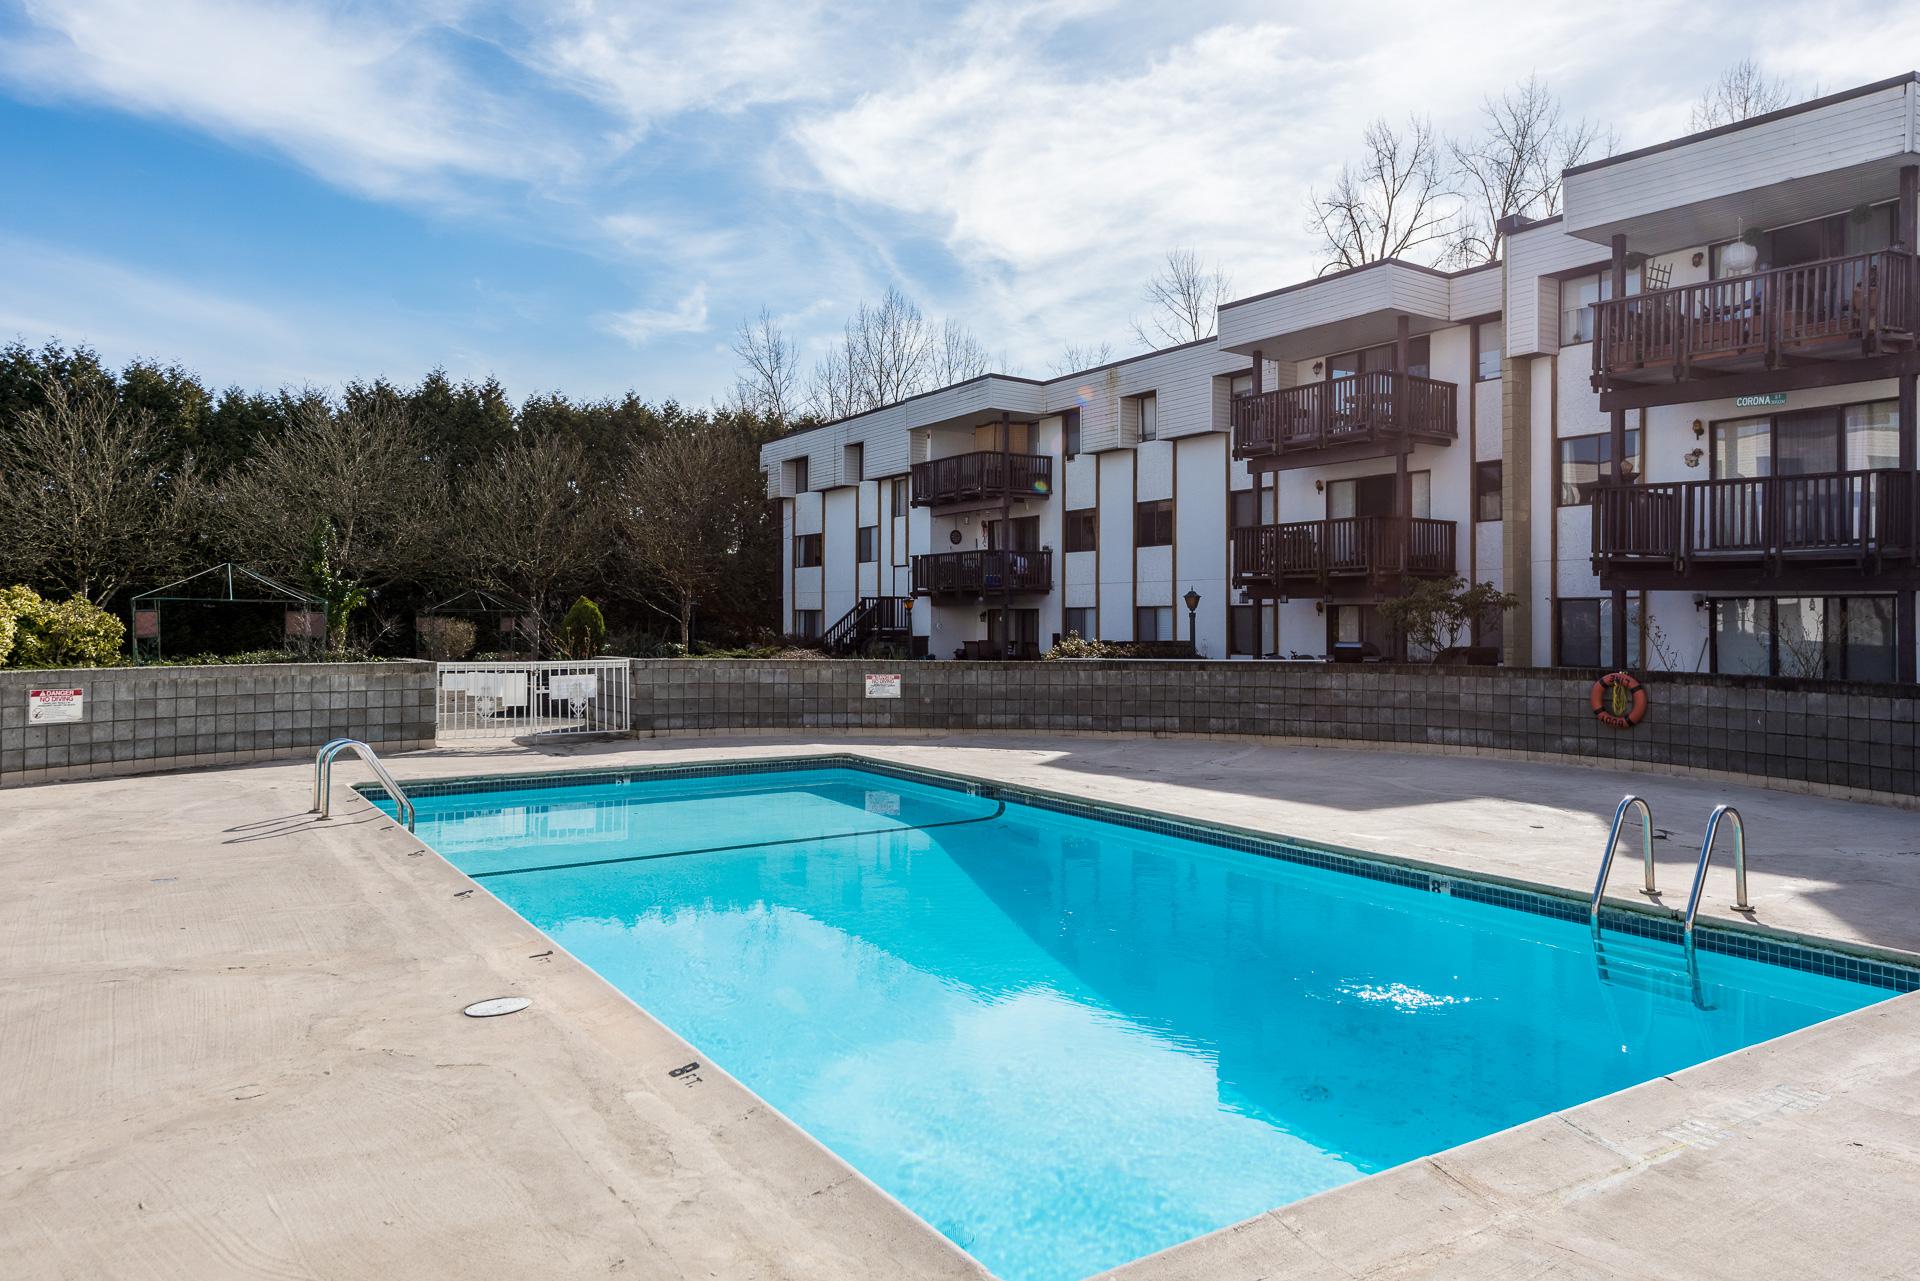 outdoor pool at Wildwood Terrace